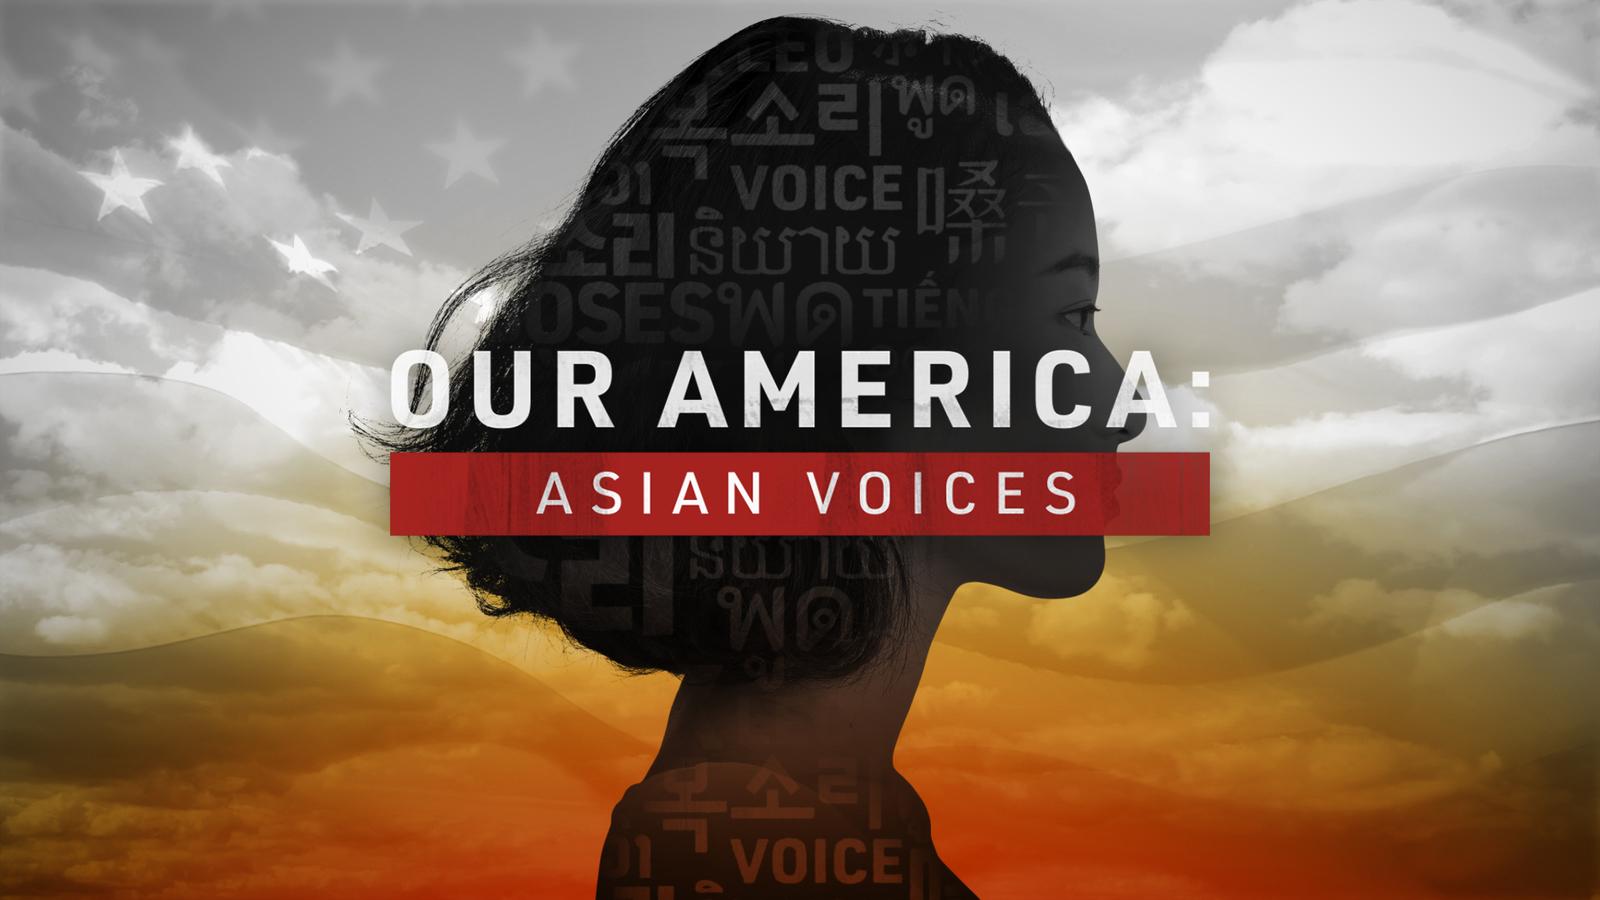 abc7news.com: Our America: Asian Voices | Official Trailer